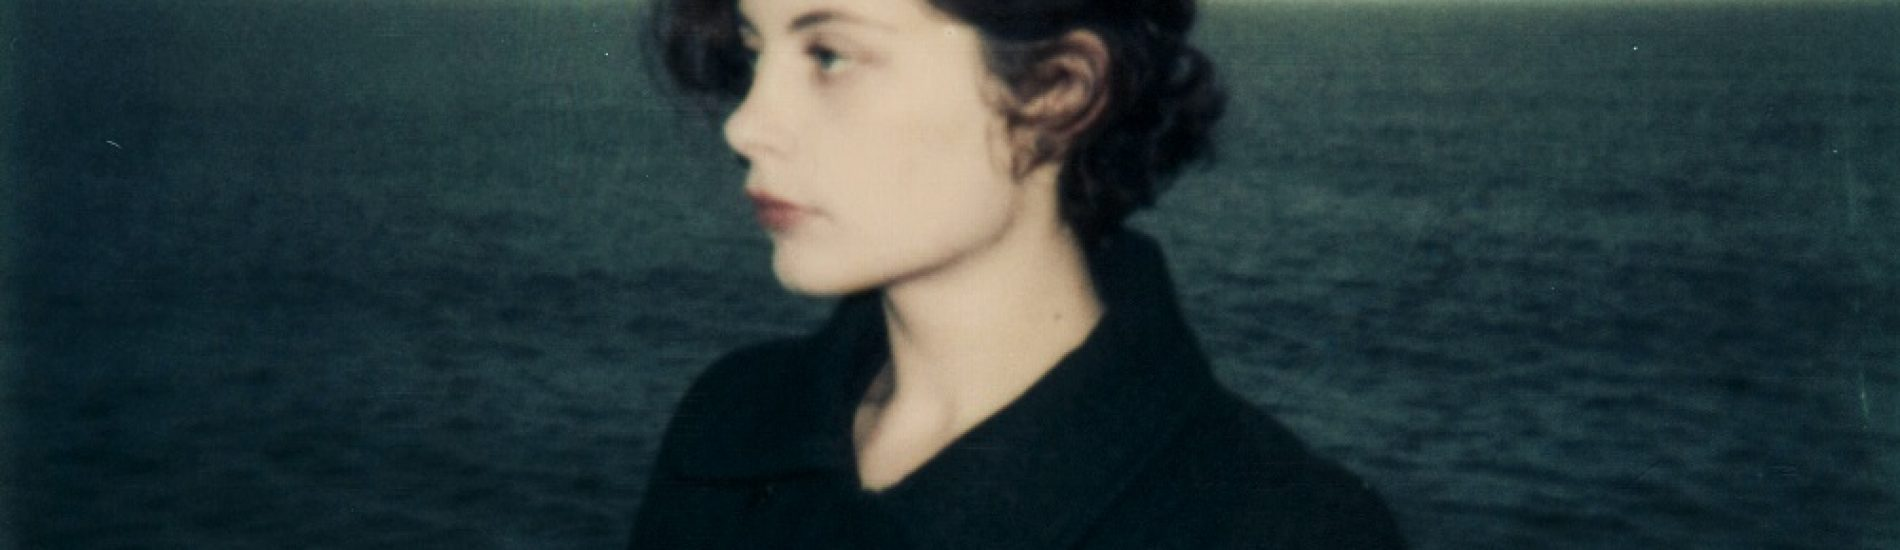 Prezentacja artystki – Olga Anna Markowska